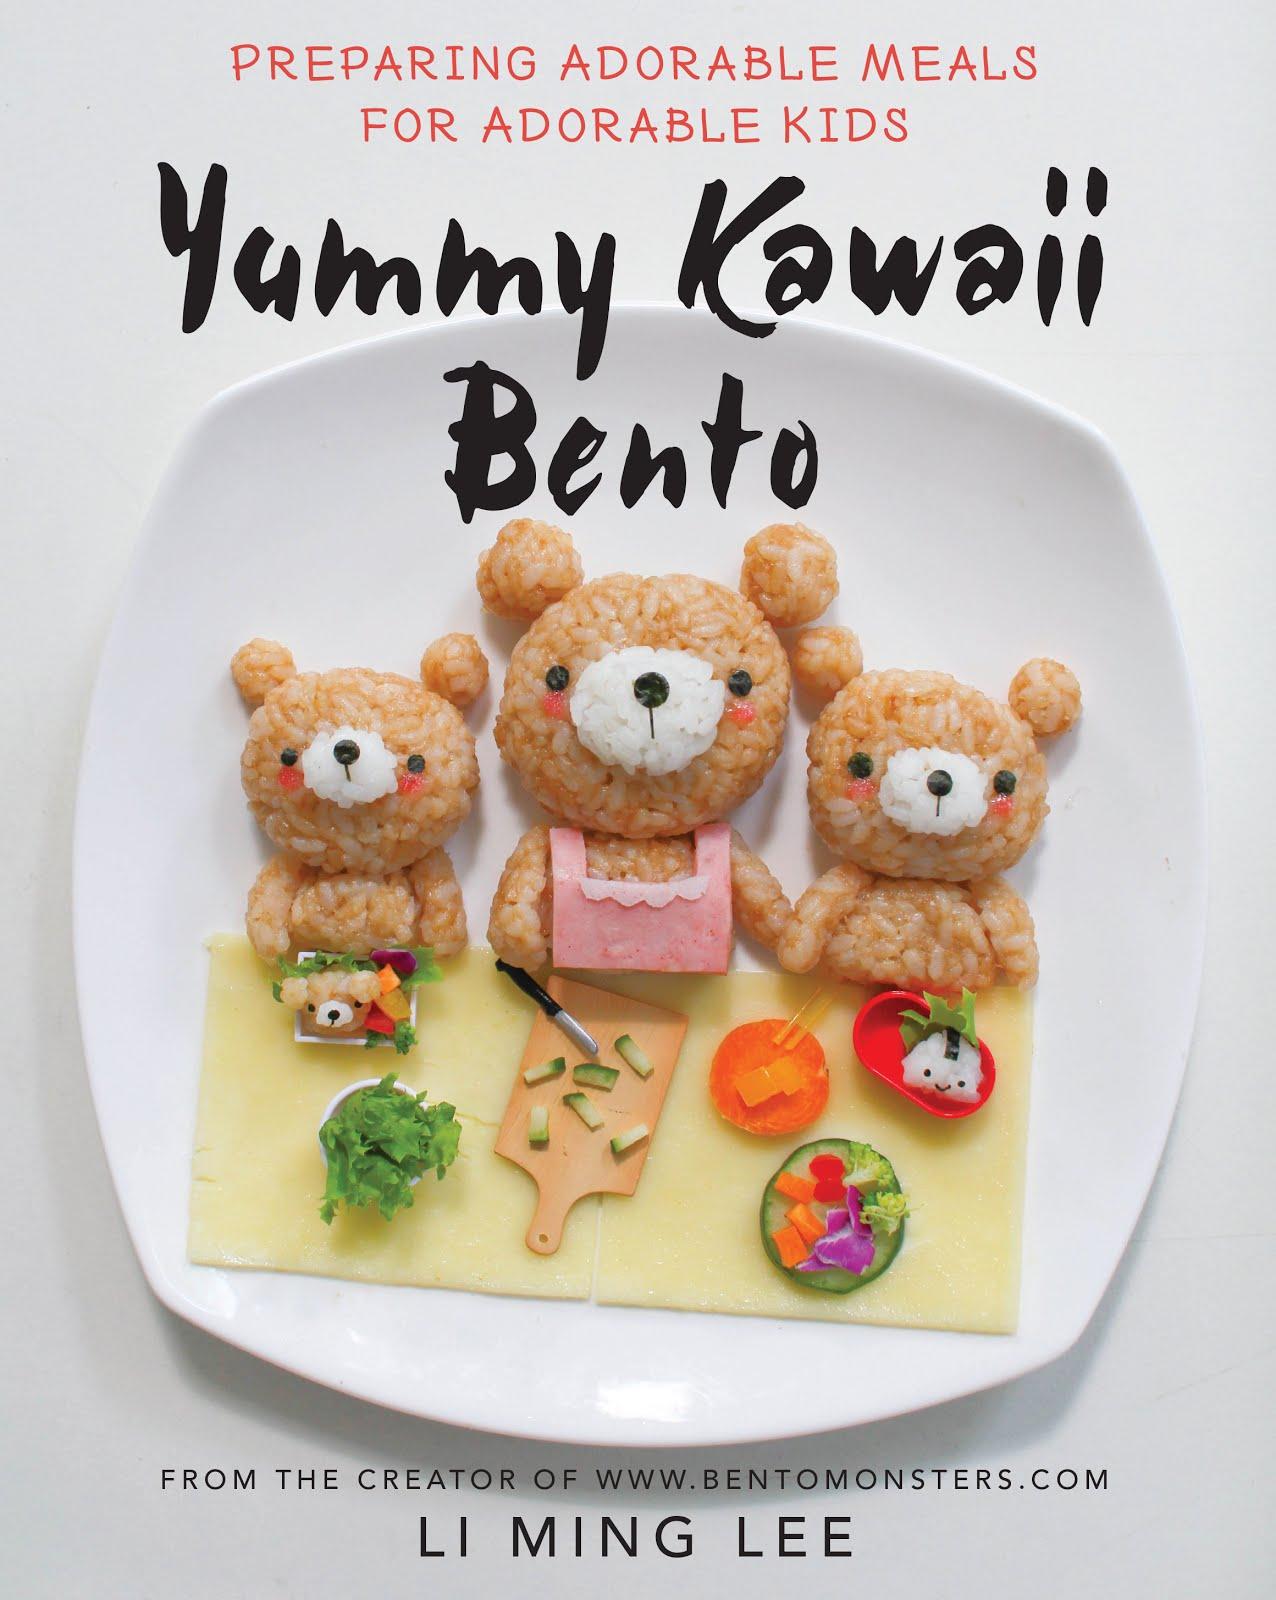 My Bento Book